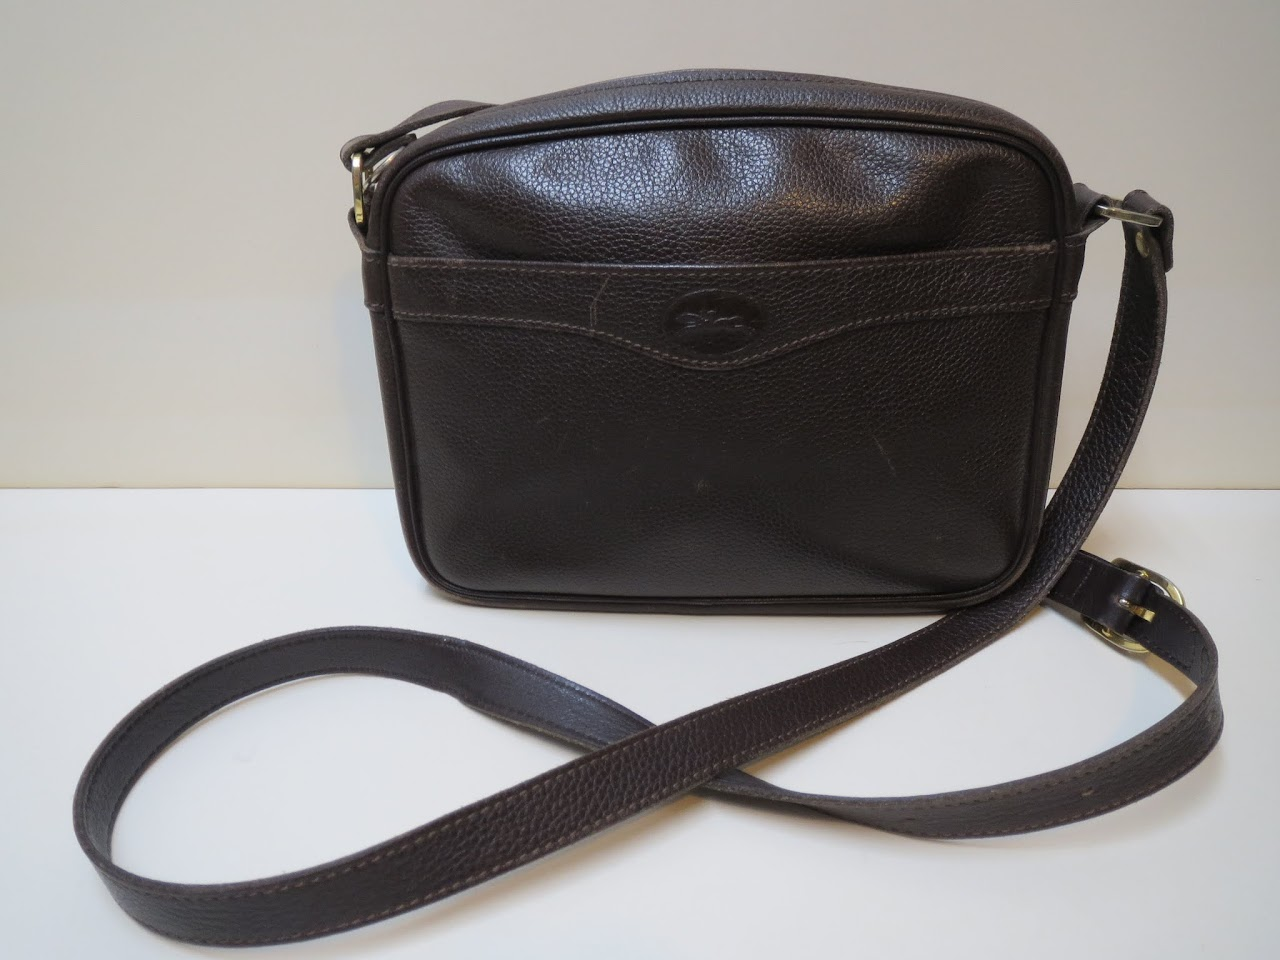 Longchamp Dark Brown Crossbody Bag